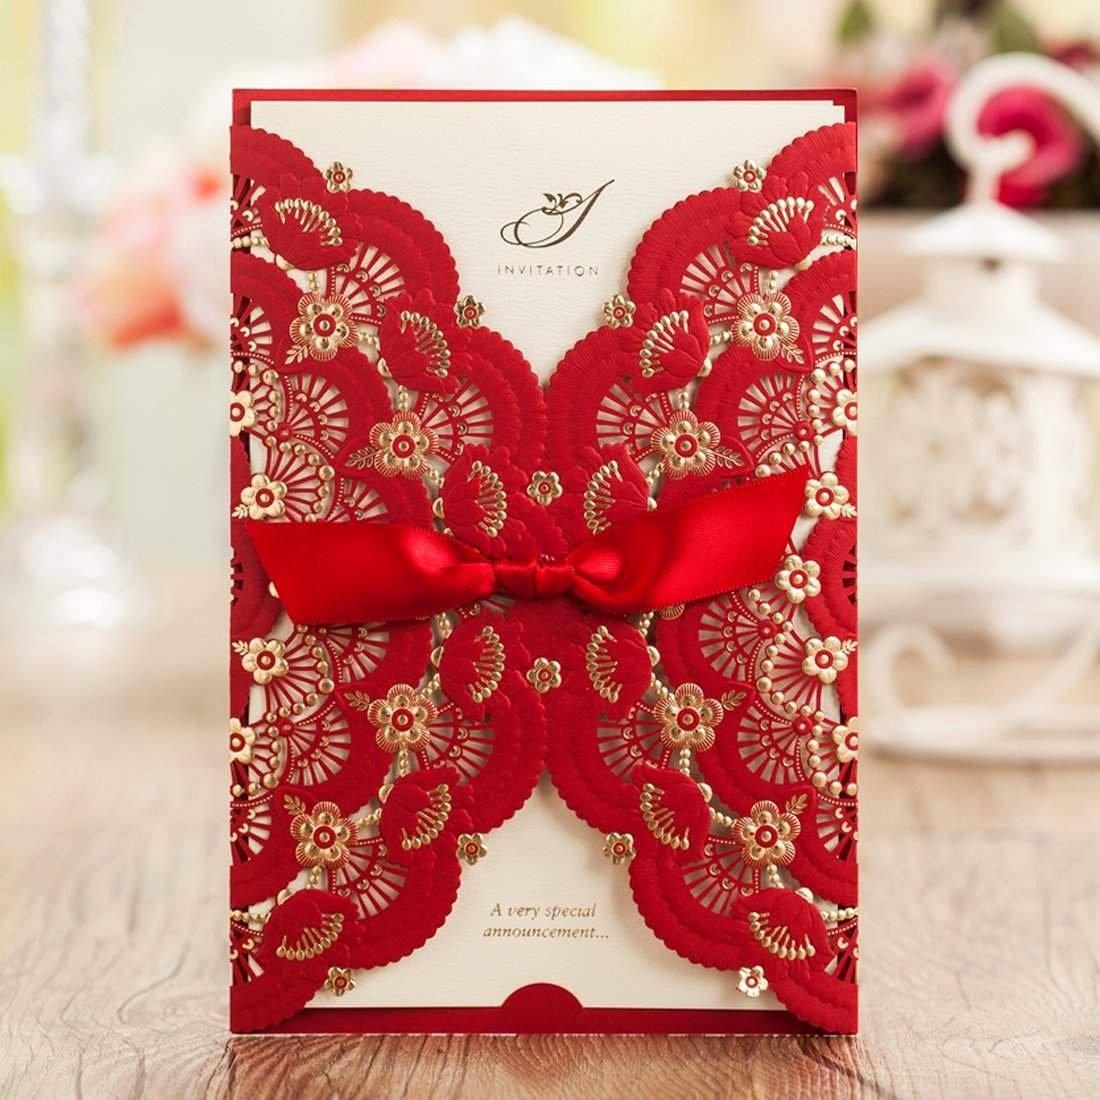 Wedding Invitation Diy Template Beautiful top 10 Best Cheap Diy Wedding Invitations